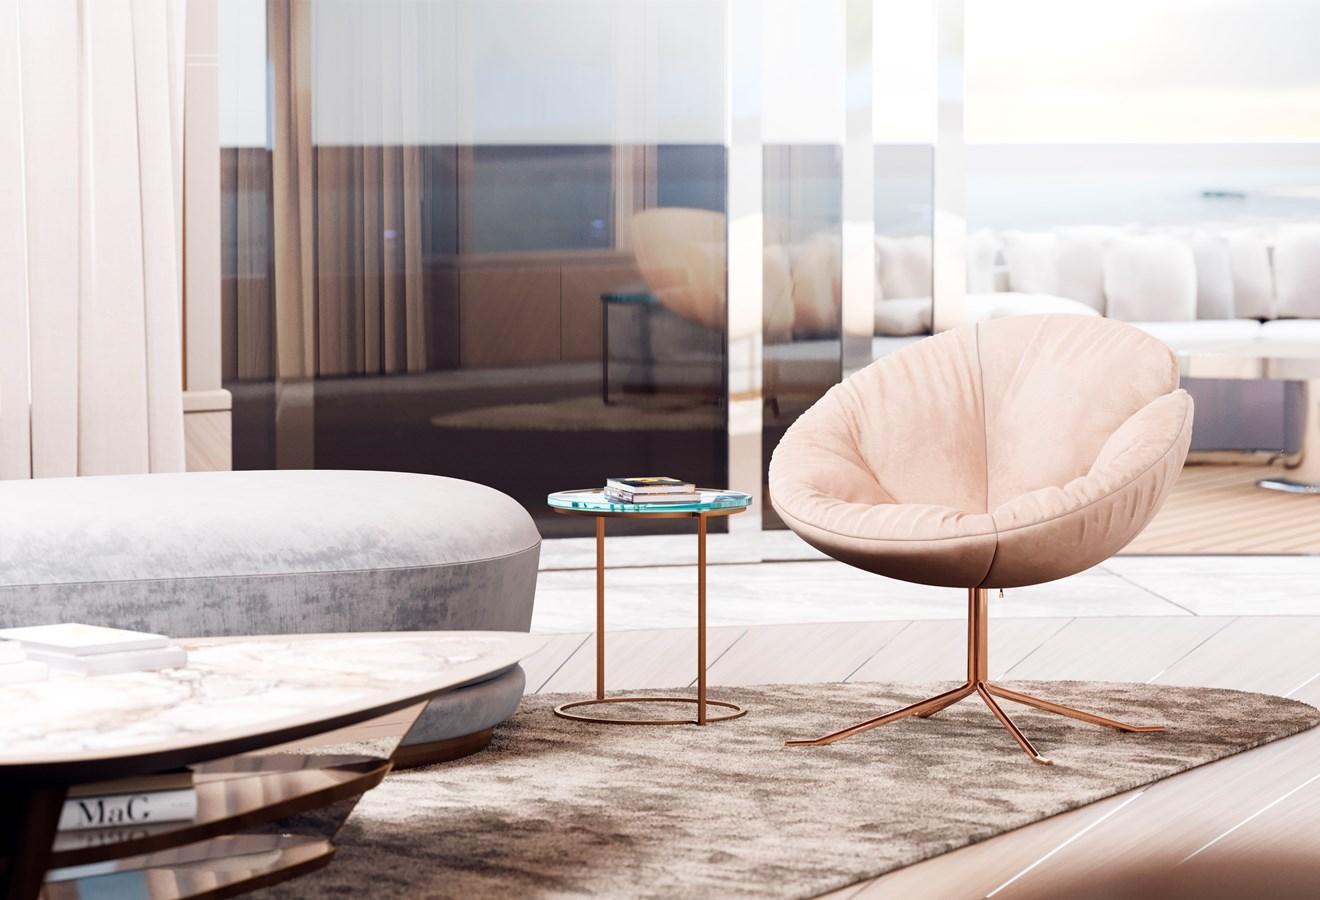 BEYOND 82M interiors- Fotiadis Design (5) 2023 CUSTOM BUILT BEYOND 82 Mega Yacht 2442974